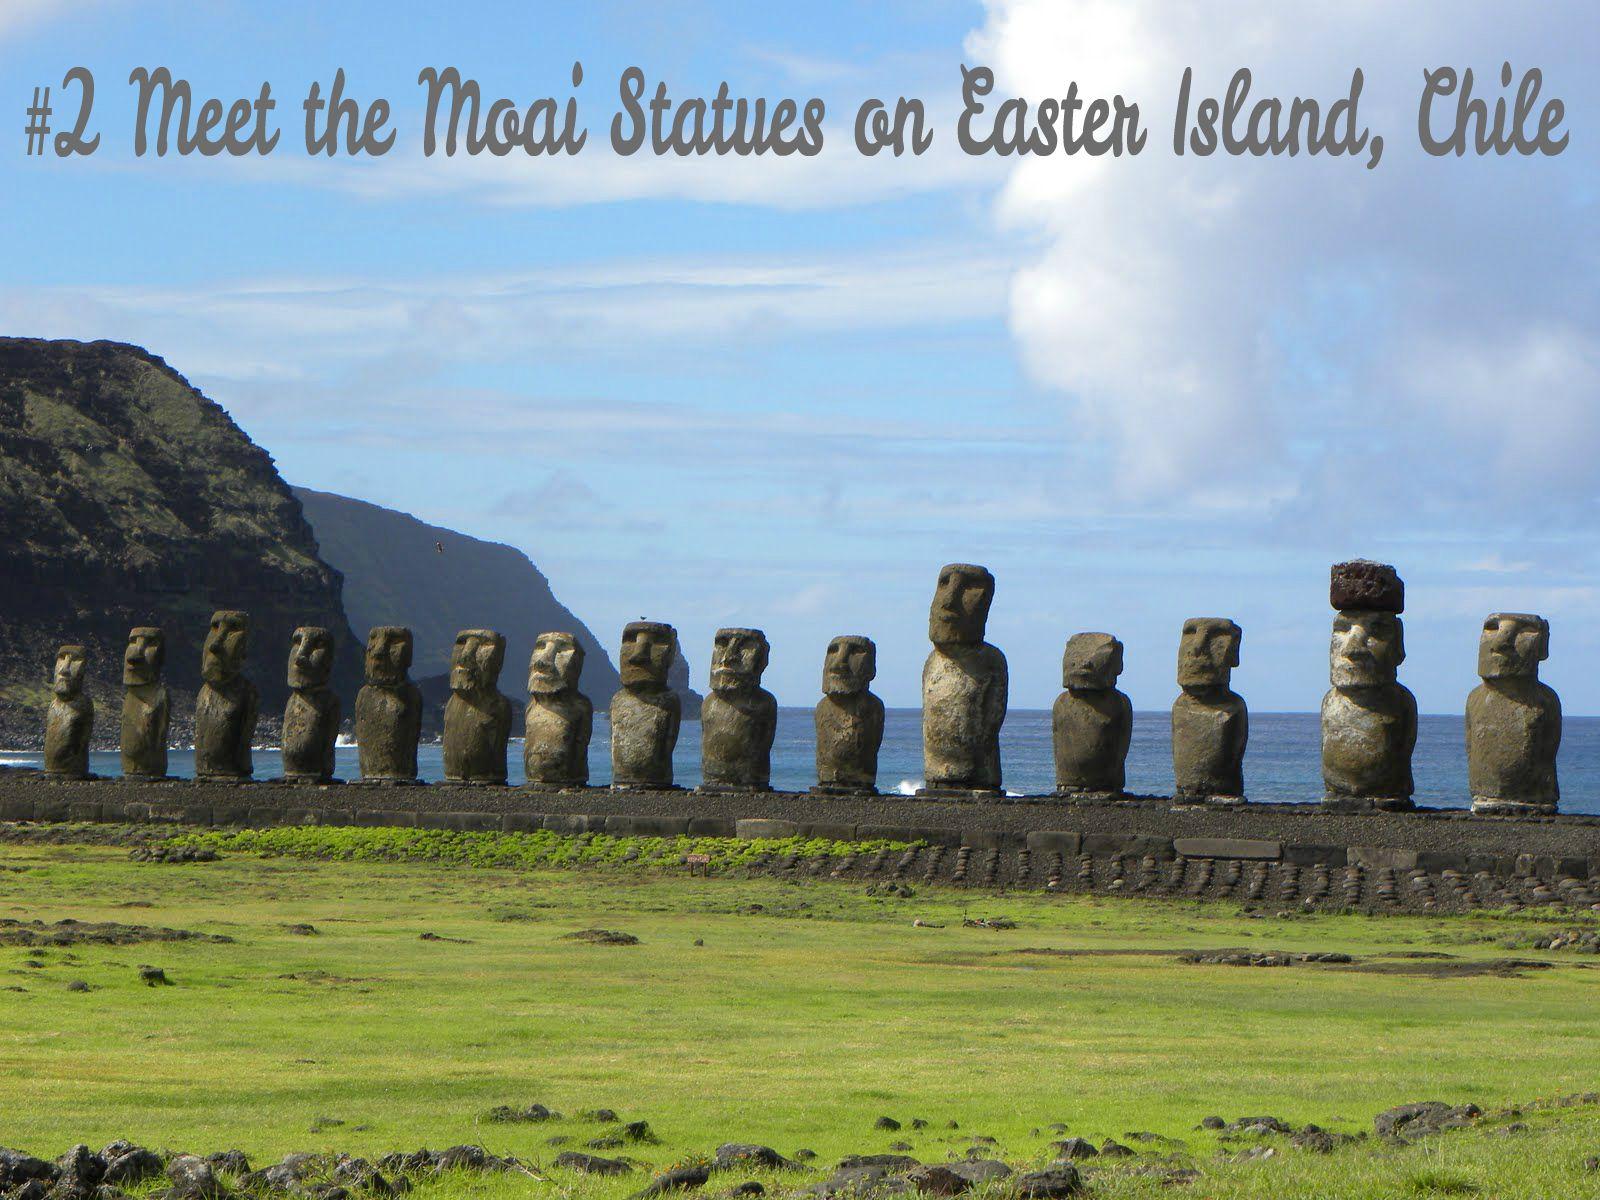 Meet the Moai Statues on Easter Island, Chile